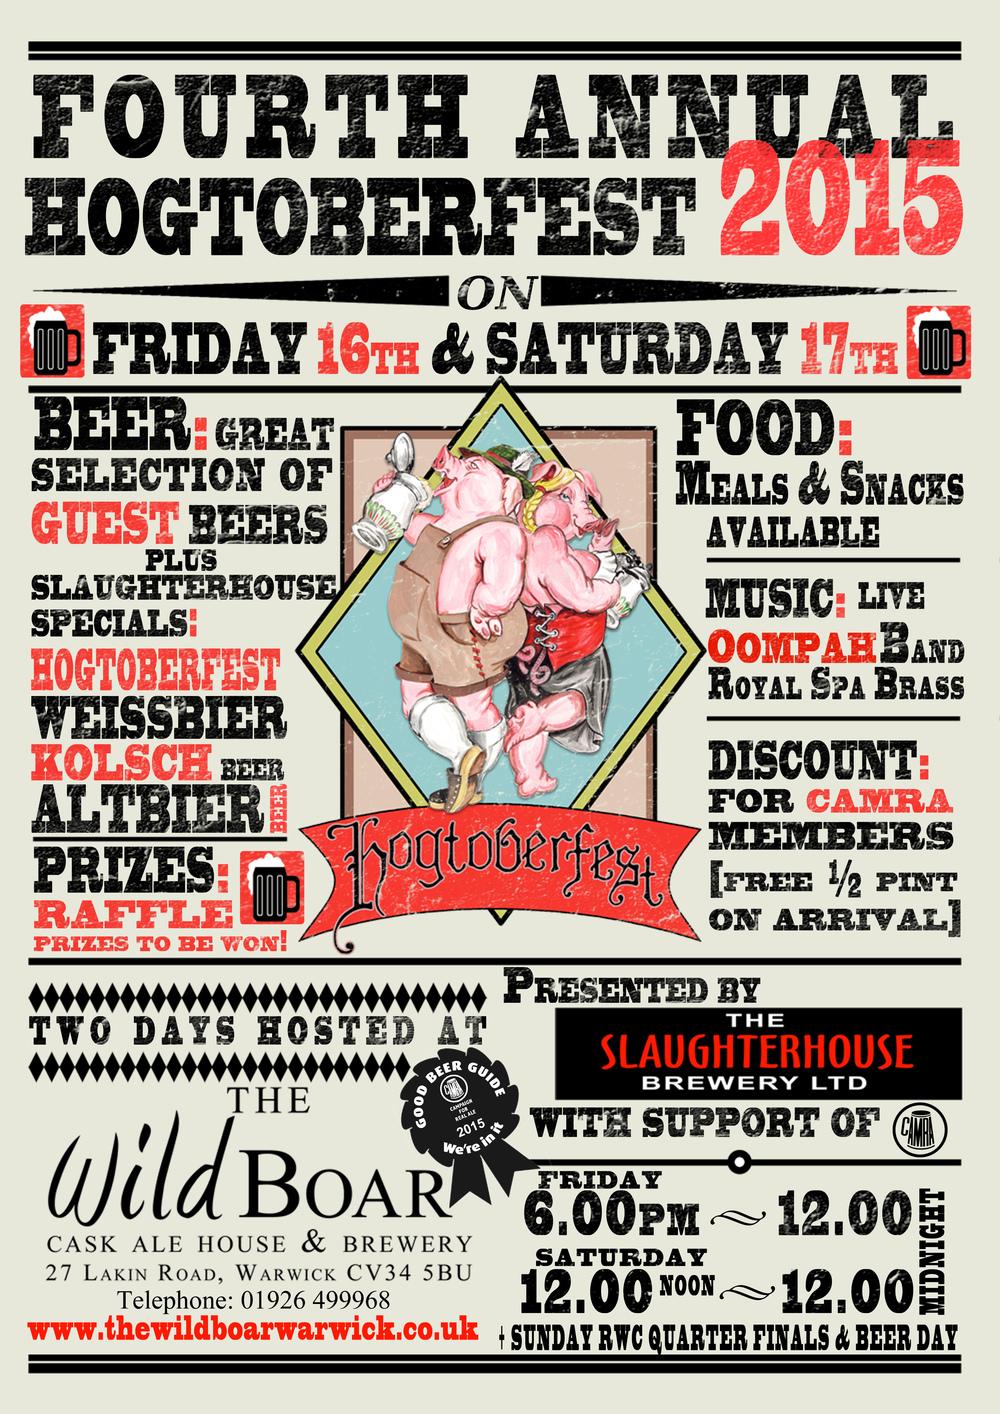 Hogfest2015 (1).jpg